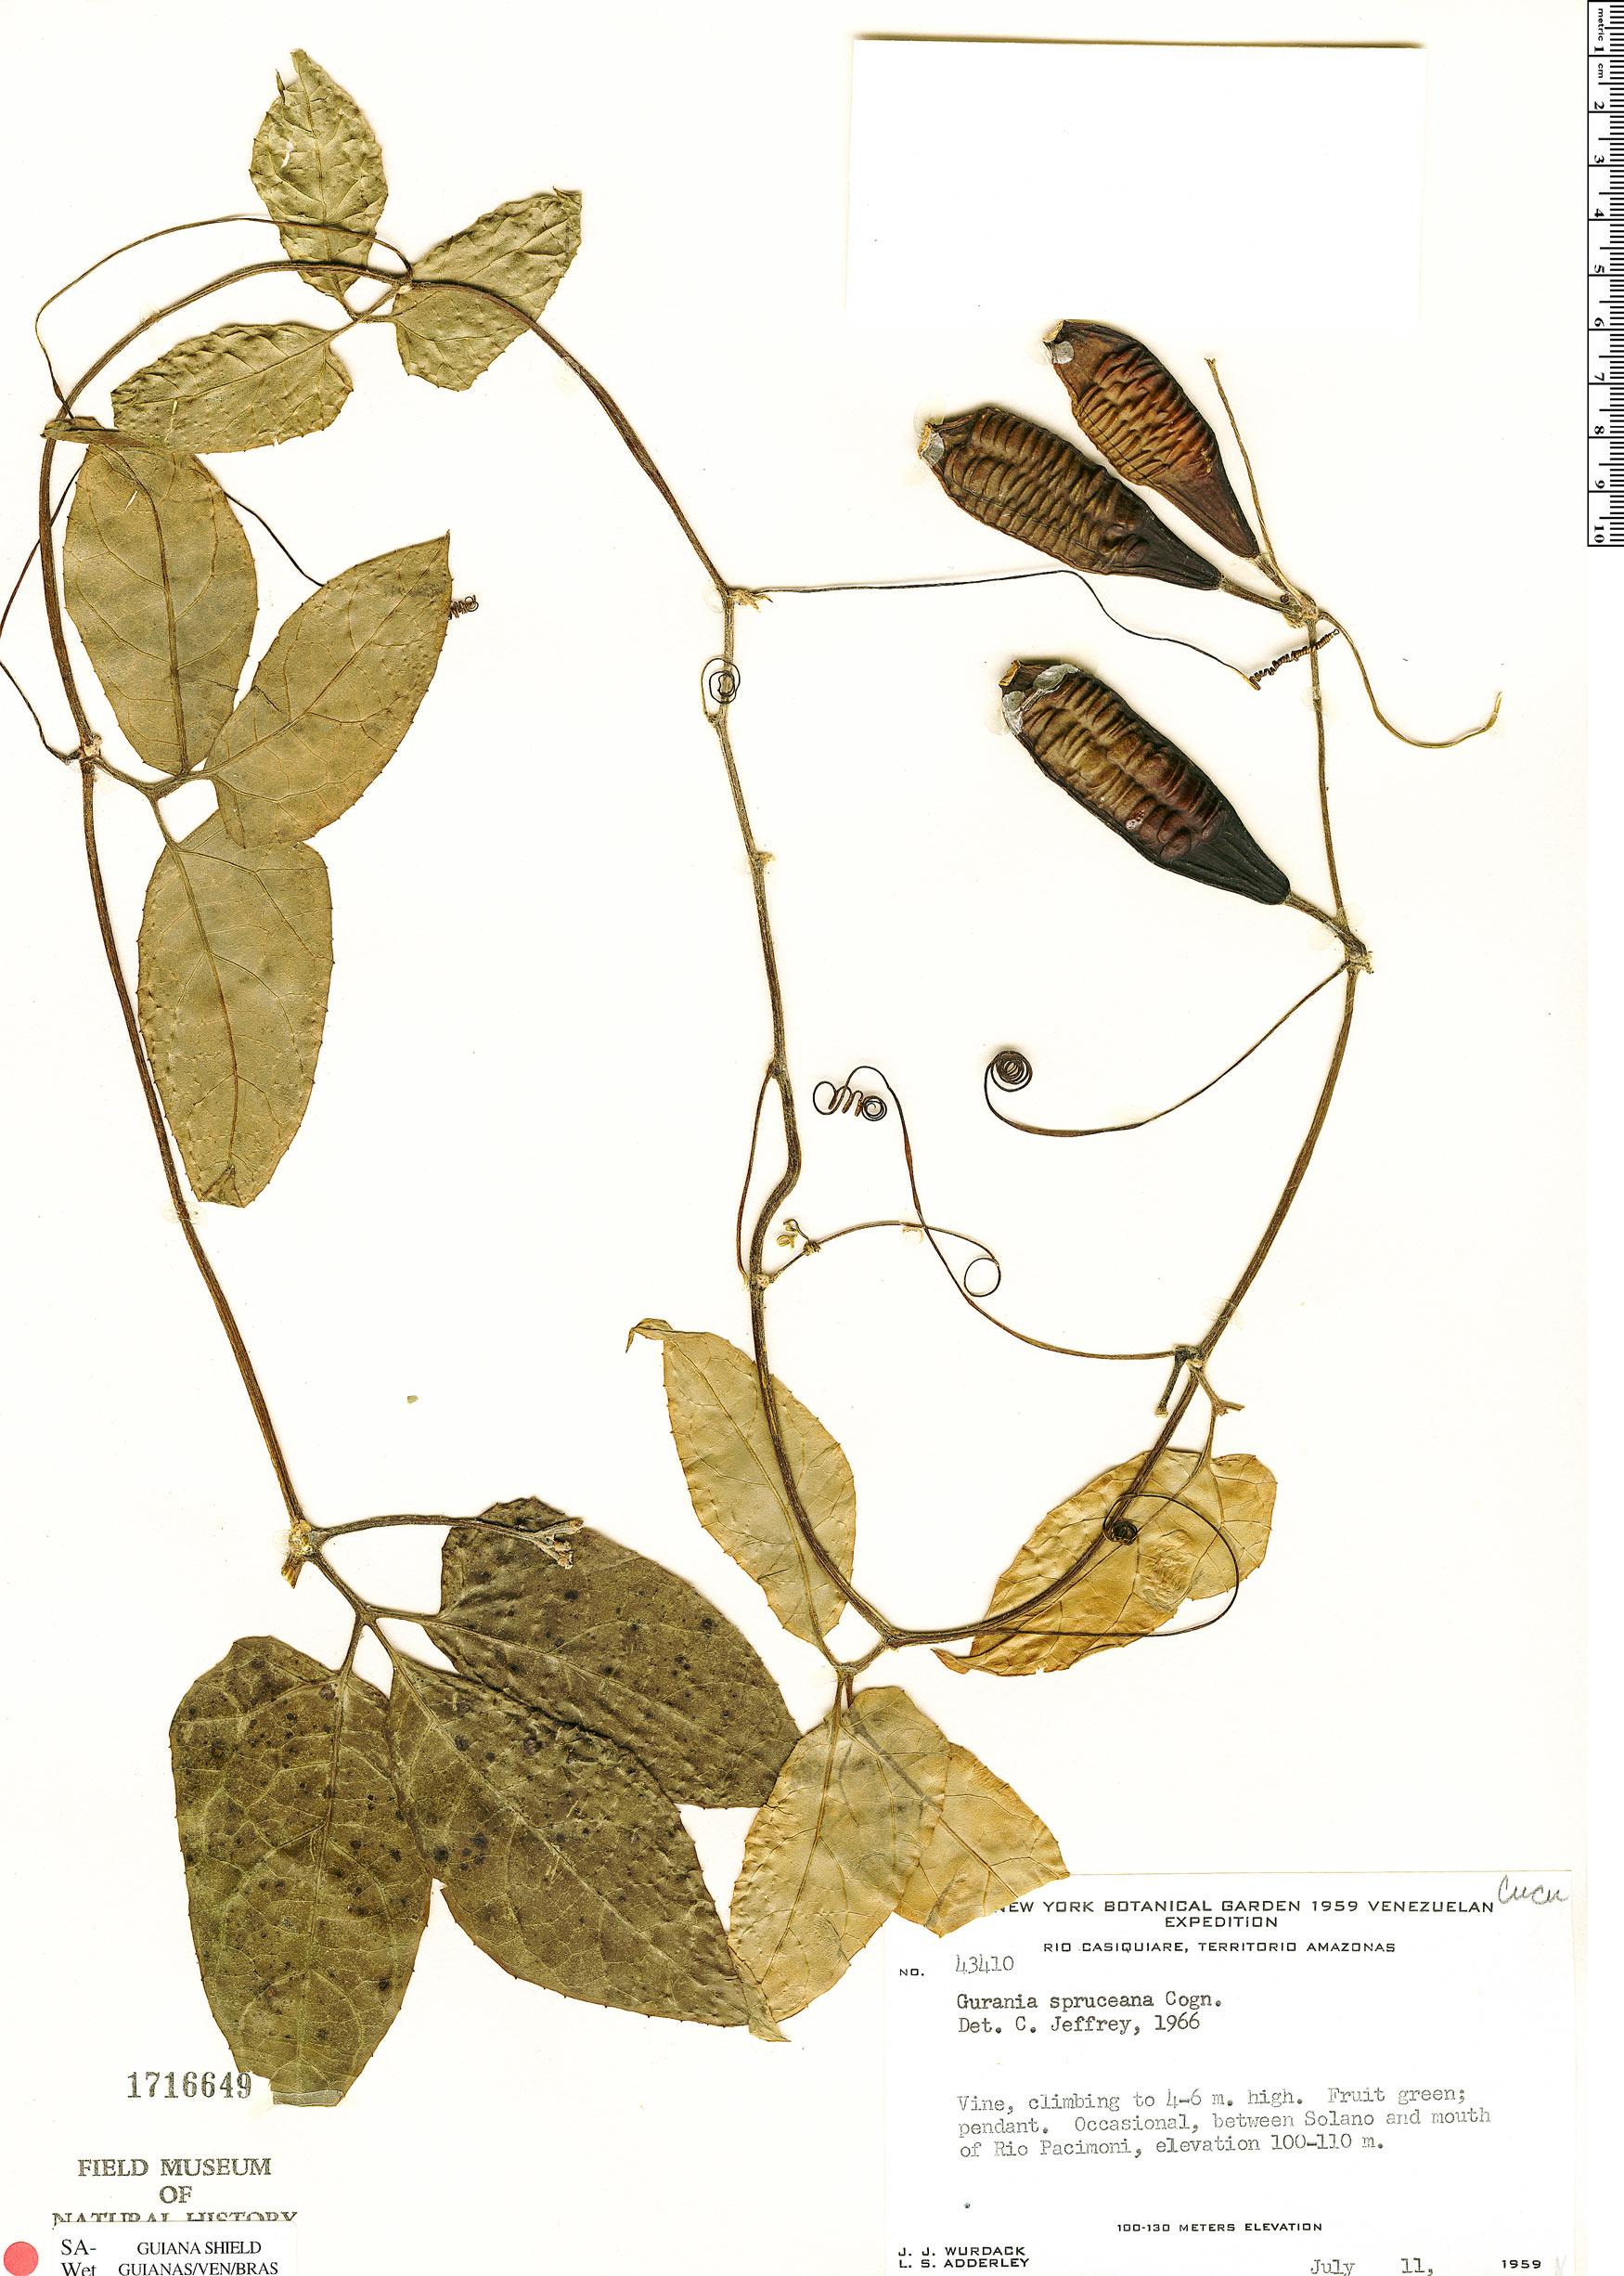 Specimen: Gurania spruceana